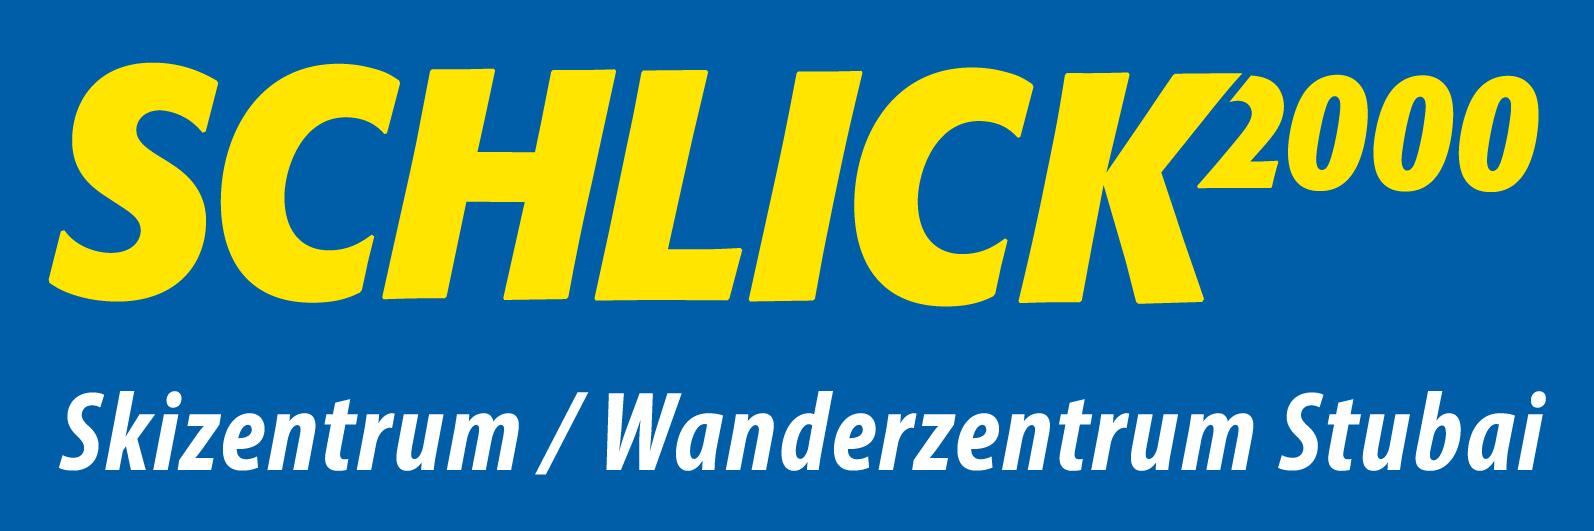 Fulpmes/Schlick 2000 - Logo